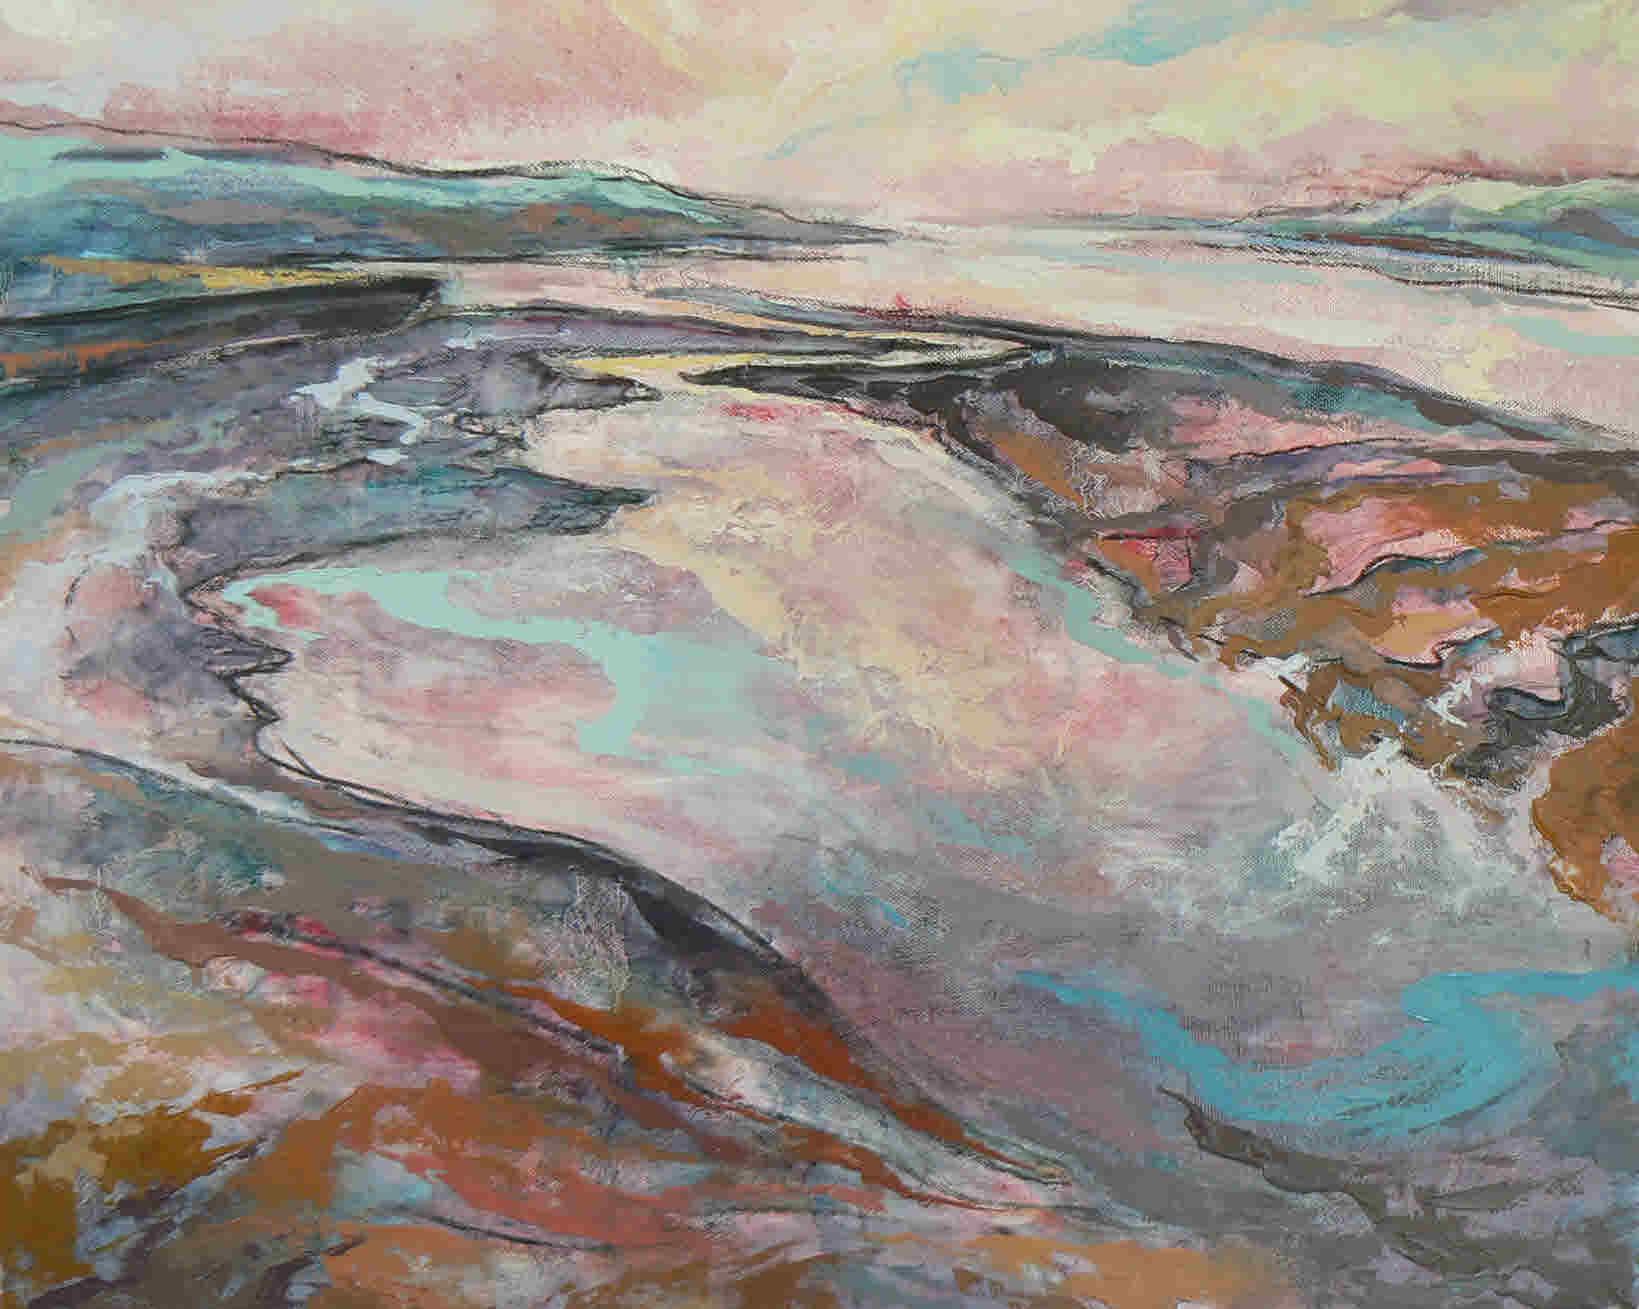 Teign Estuary in January